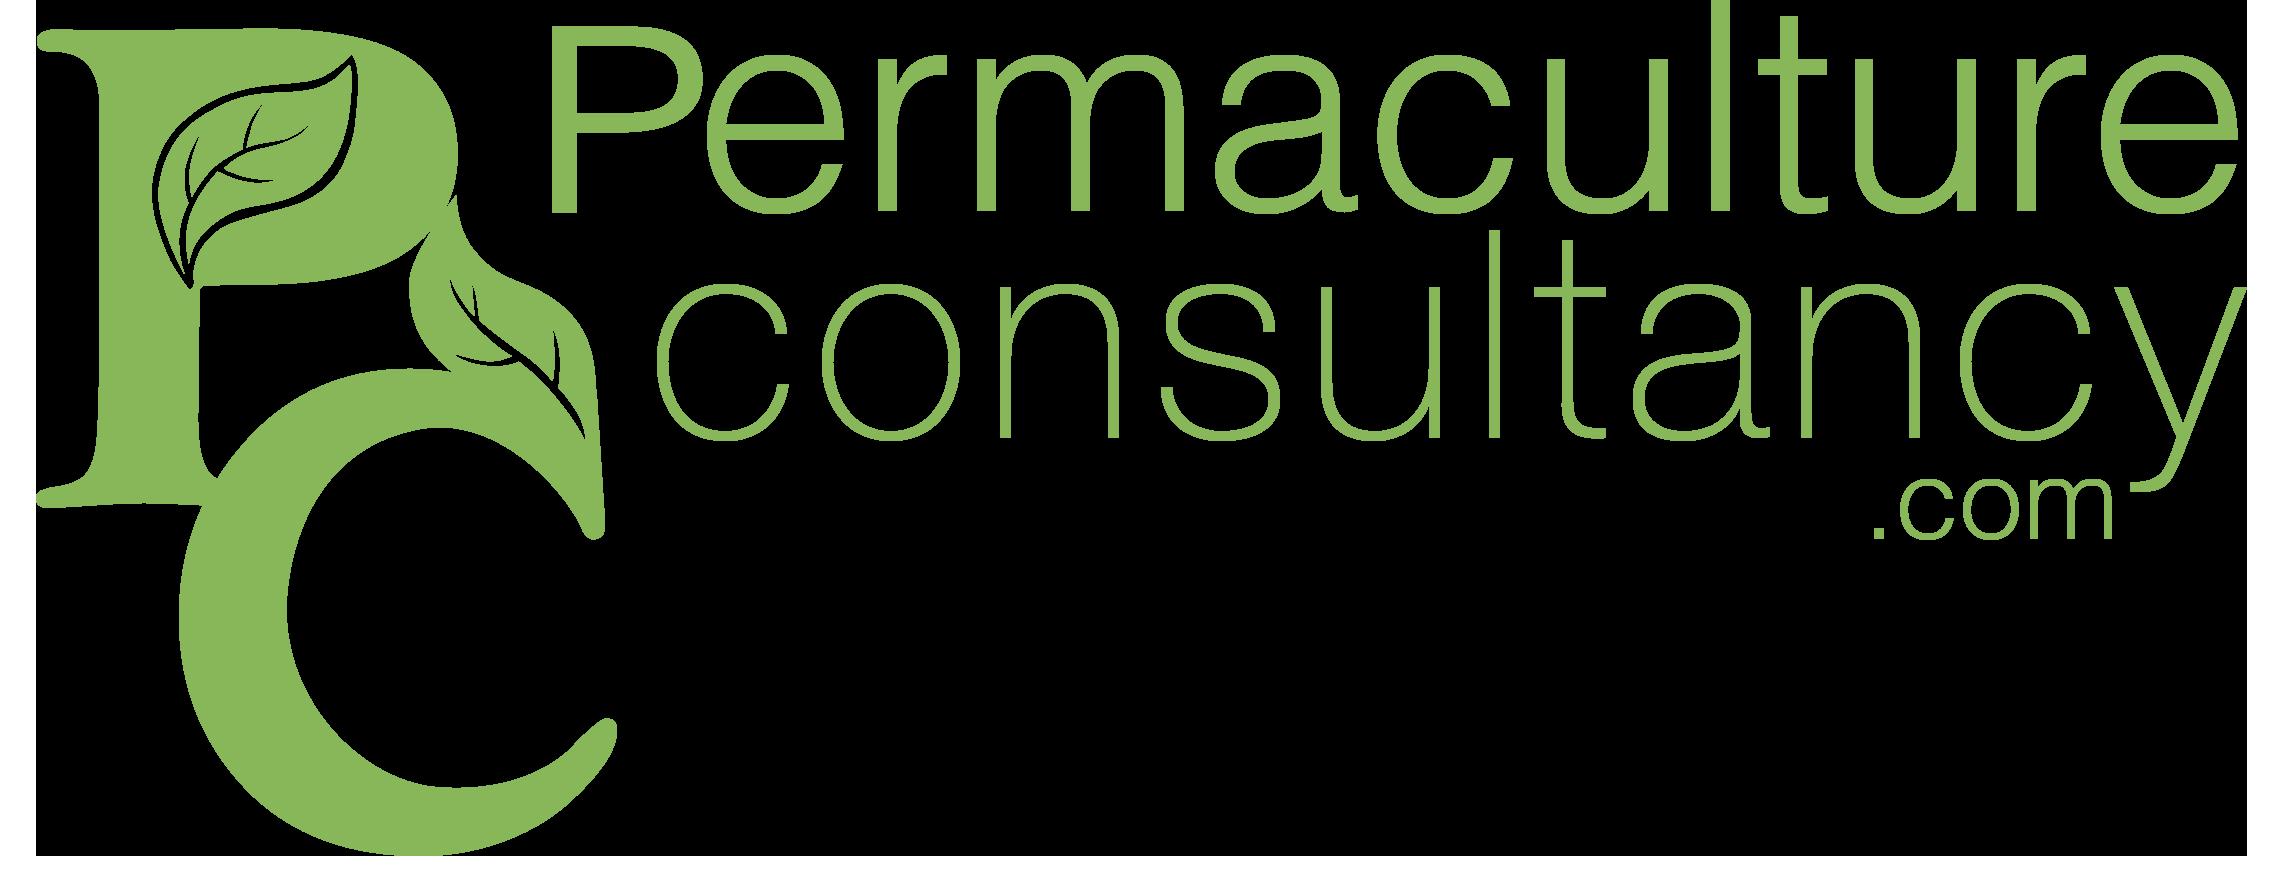 Permaculture Consultancy.com